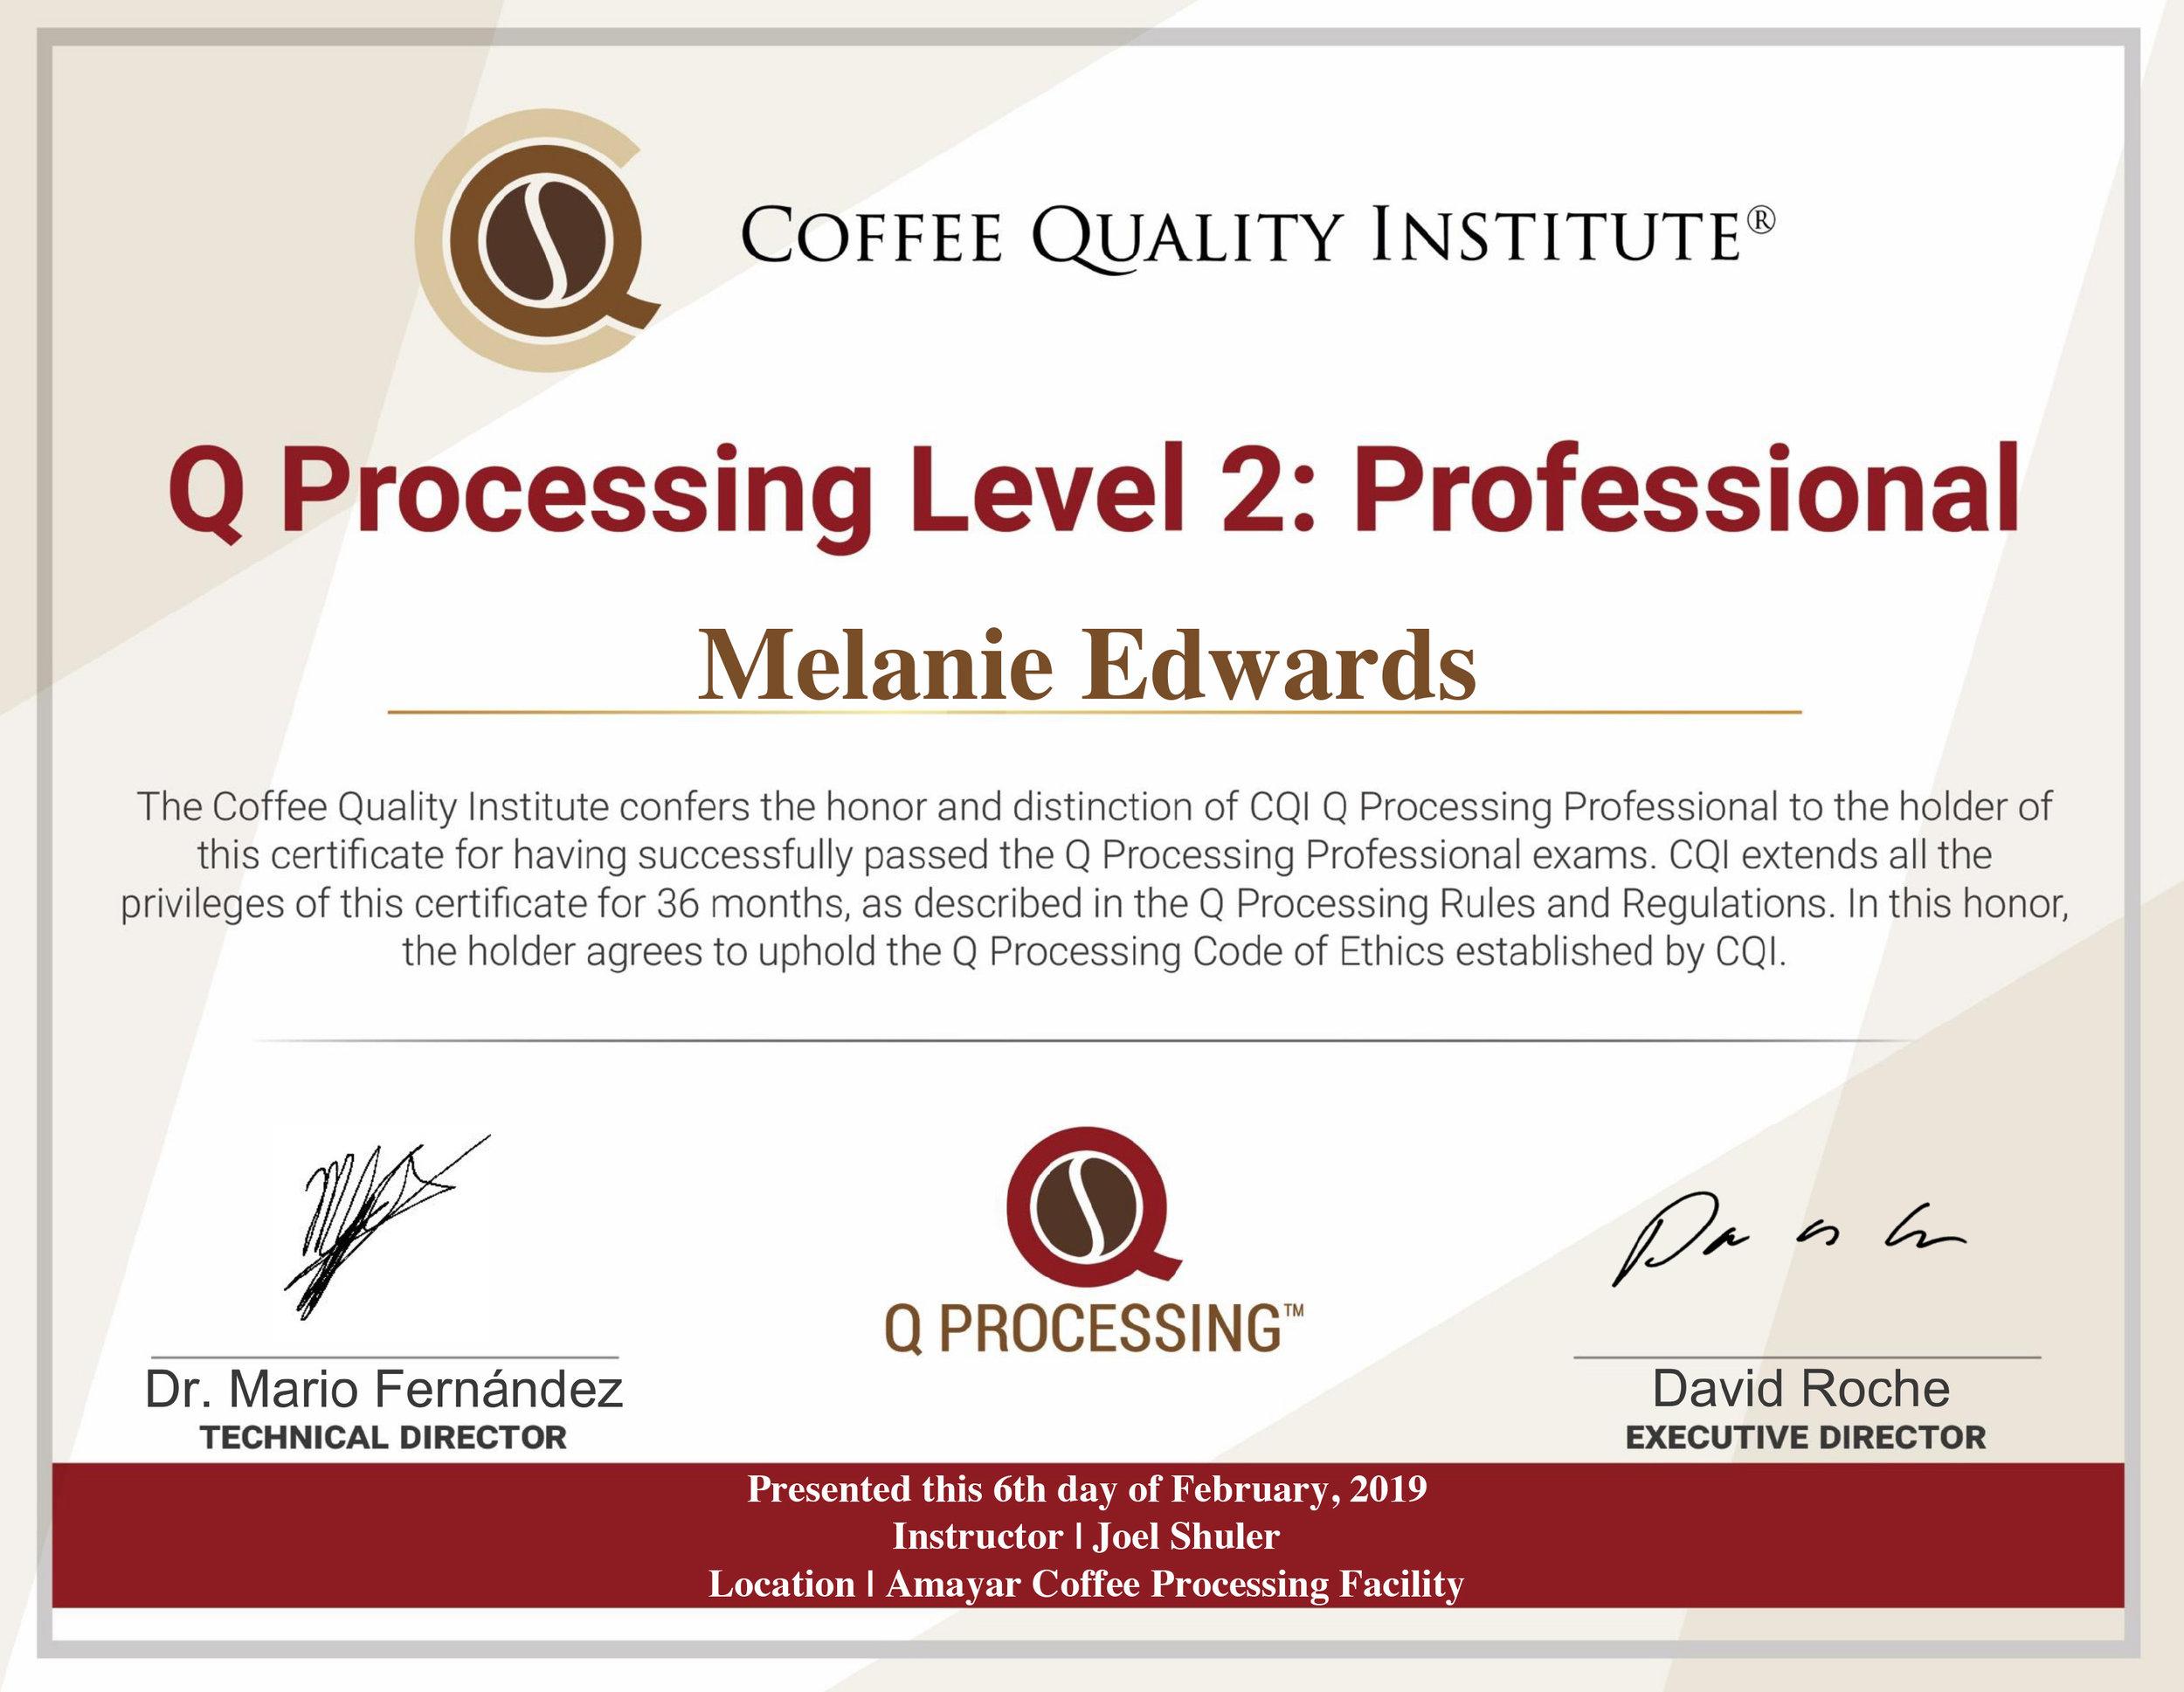 certificate_Melanie Edwards-5.jpg